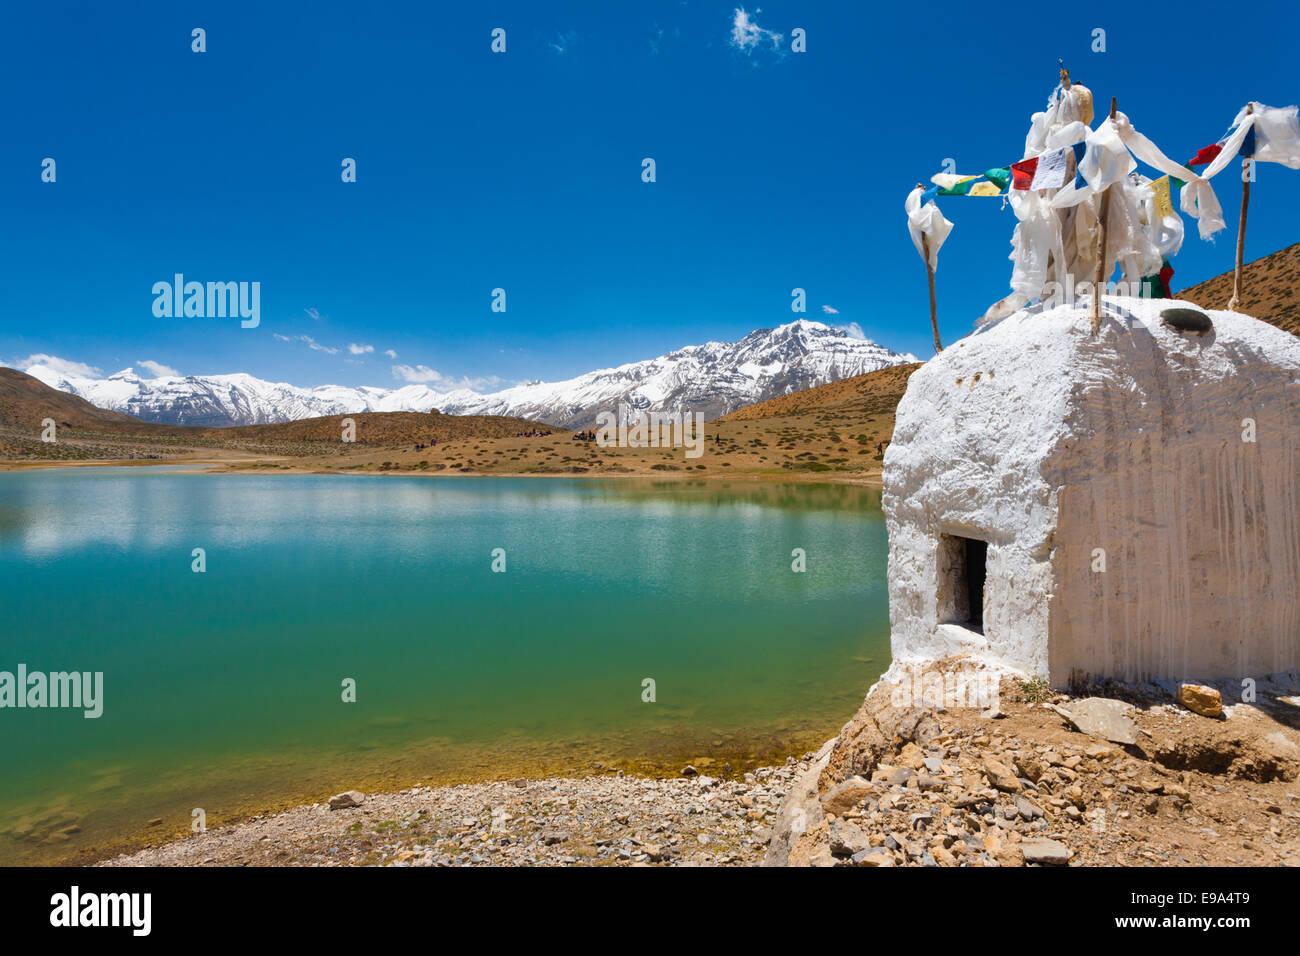 Stupa Pristine Mountain Lake Buddhist Dhankar - Stock Image